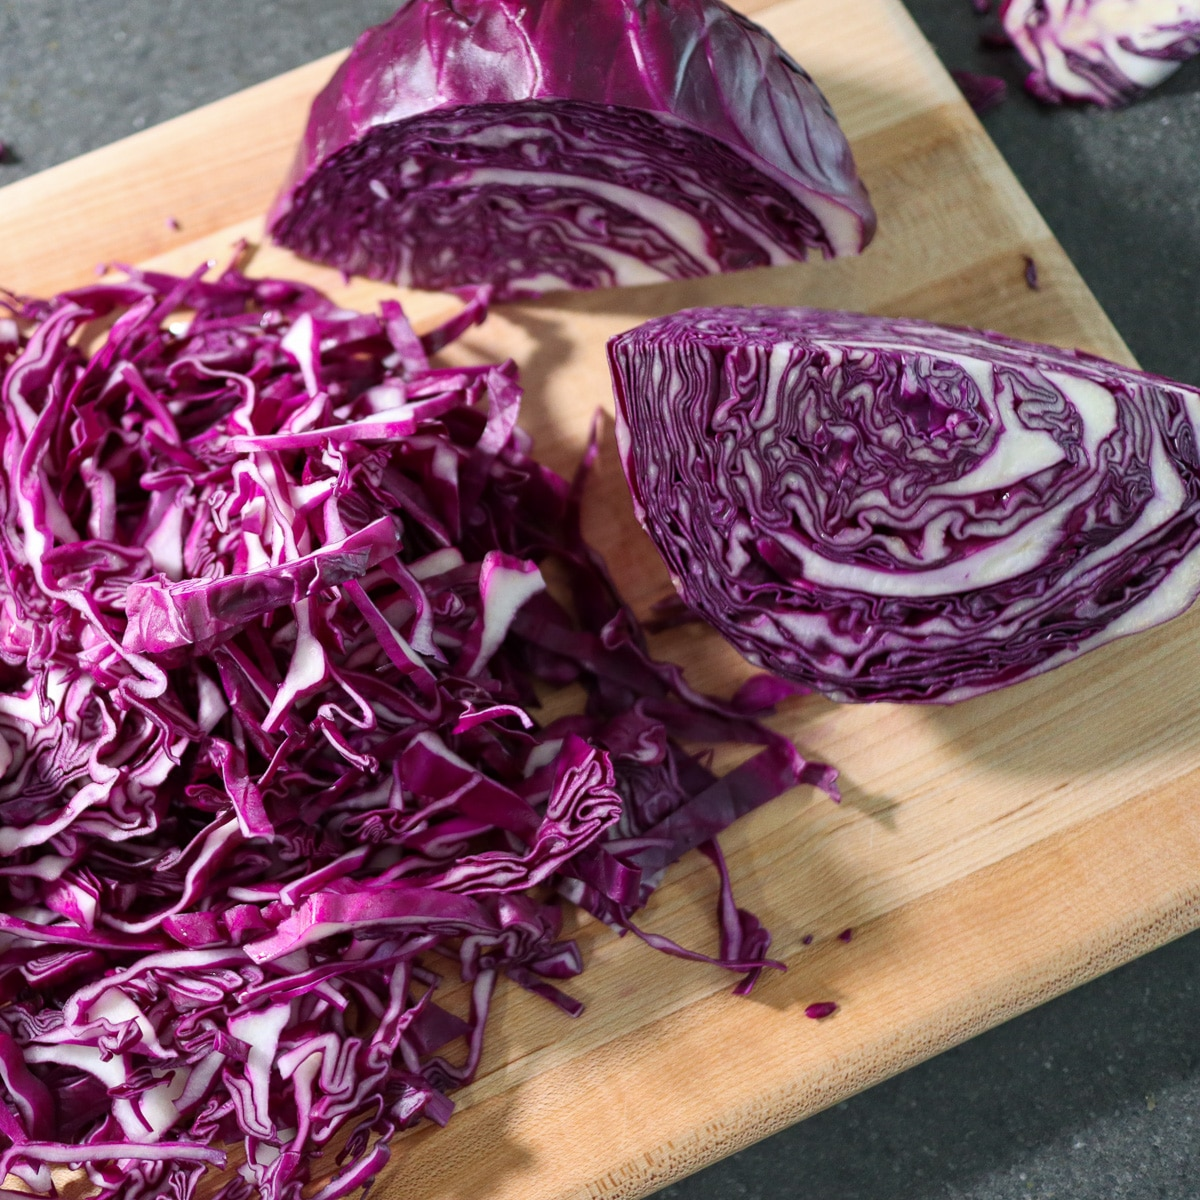 cabbage cut on a cutting board